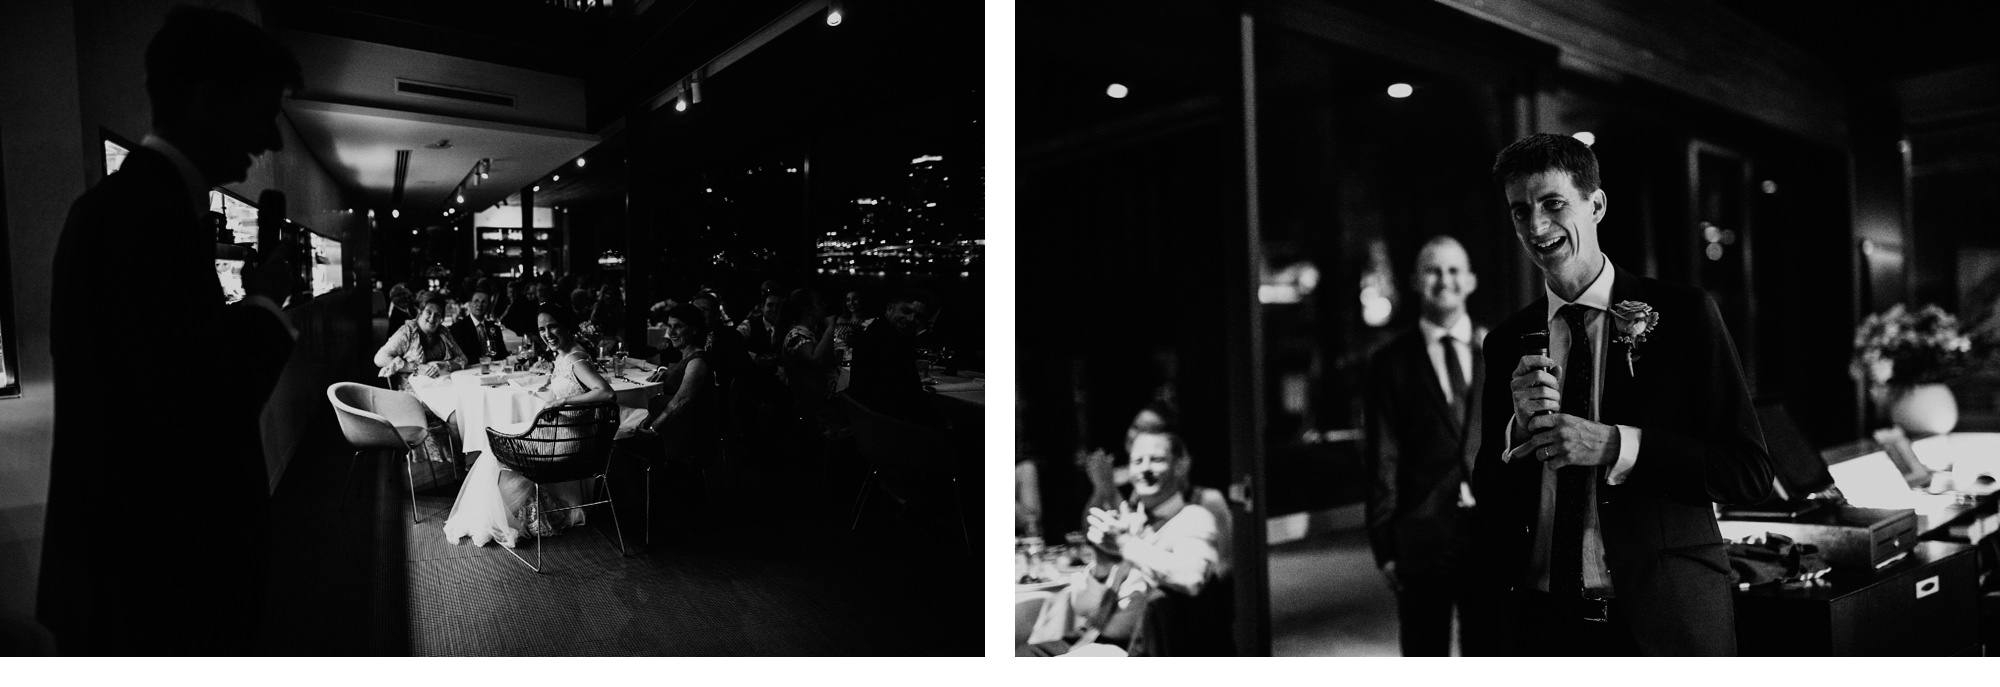 Brisbane_Shona and James_Morgan Roberts_4135.jpg